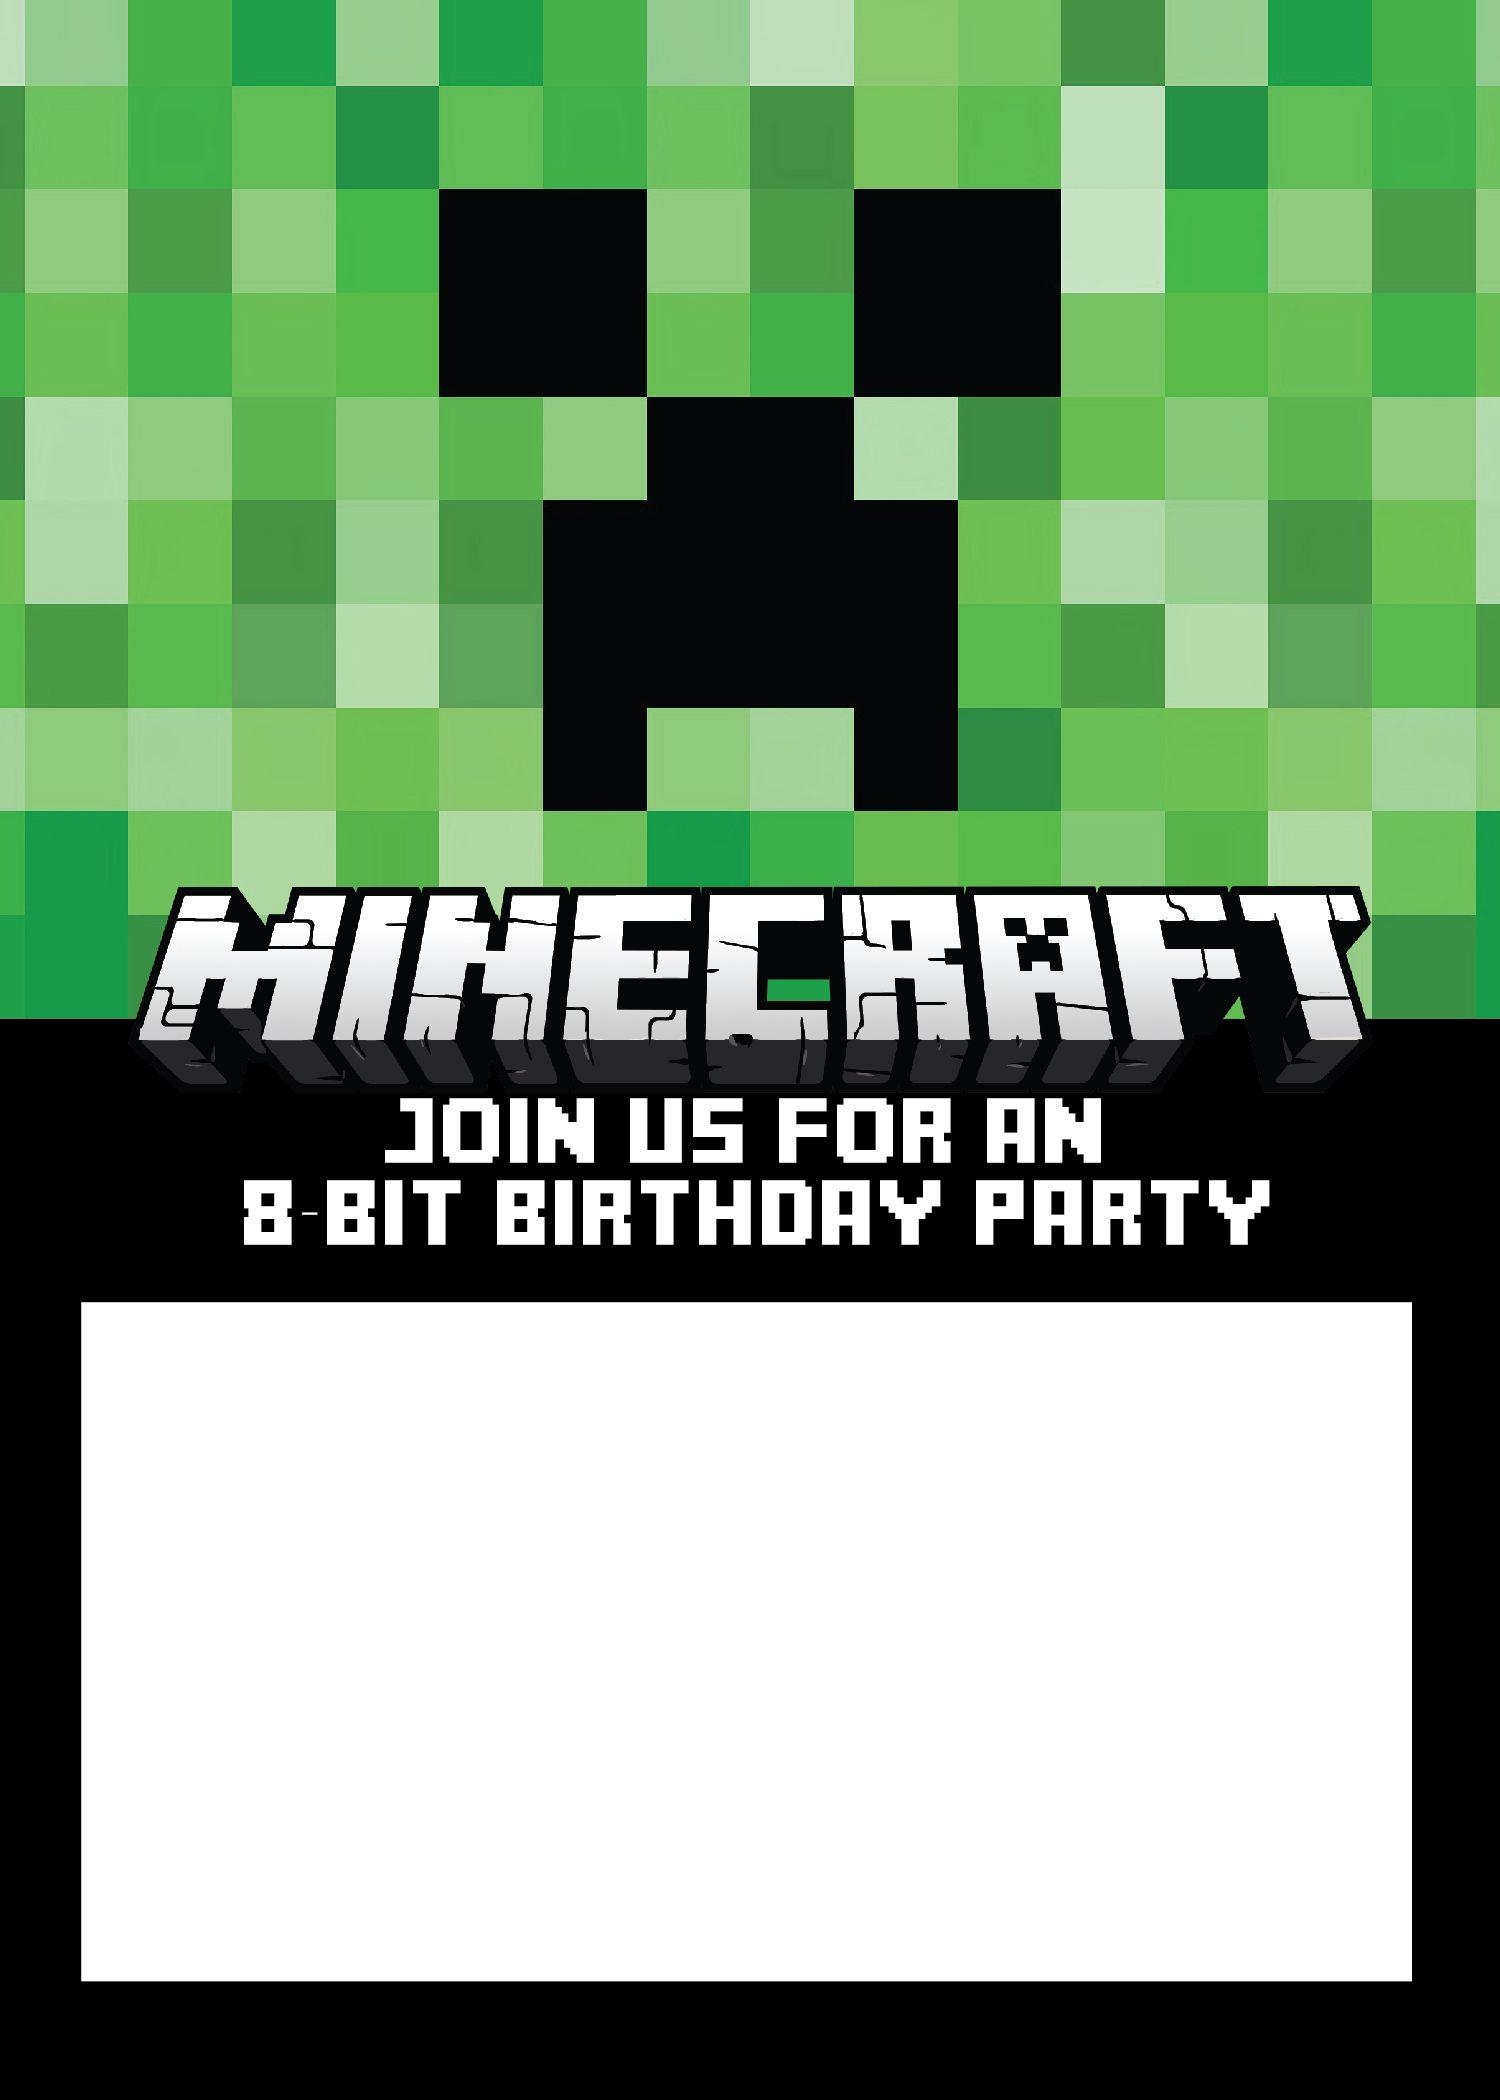 Invitacion Fiesta Minecraf Pinterest Birthdays - Minecraft birthday invitation maker